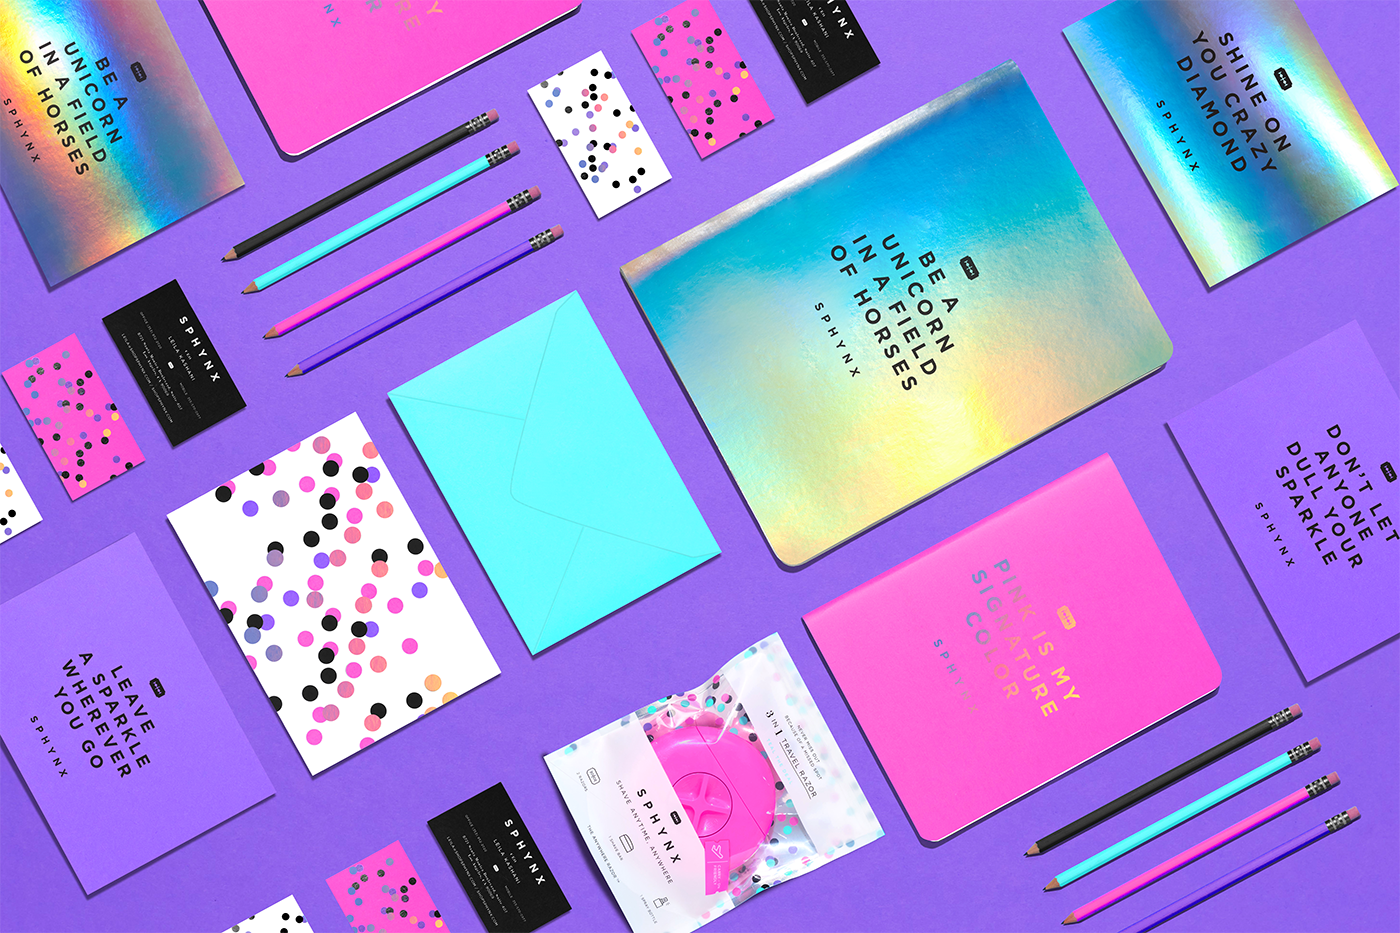 sphynx Razor beauty Packaging polkadot shaving purple pink holographic